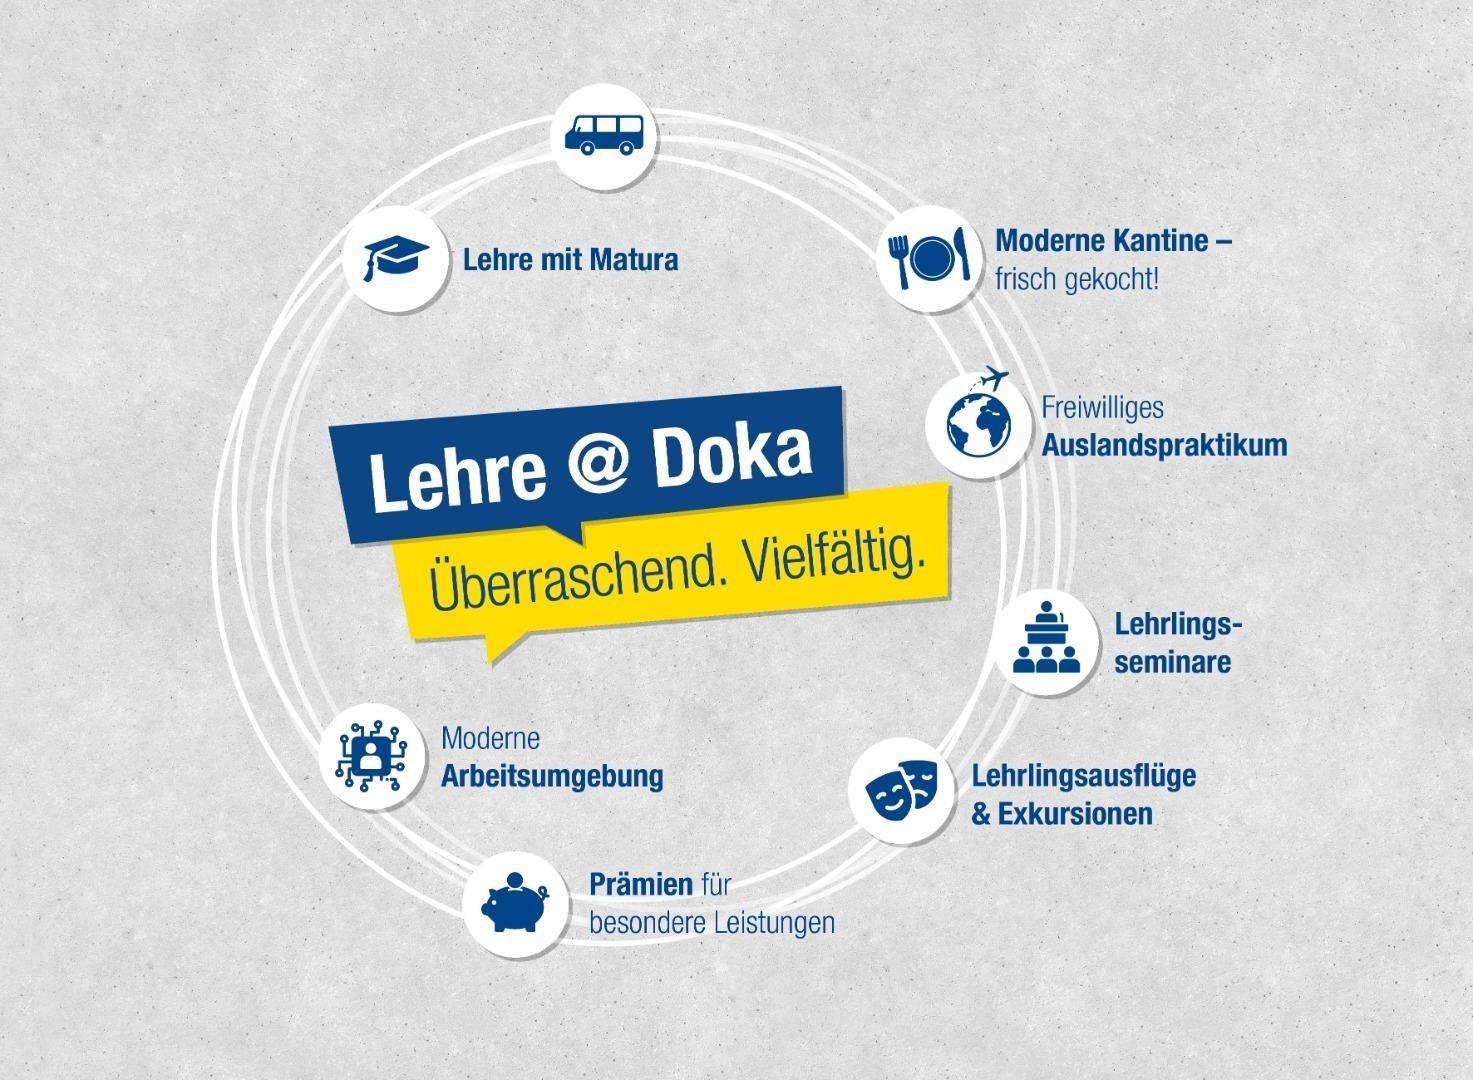 Lehre_at_Doka_Kreis-fina.jpg